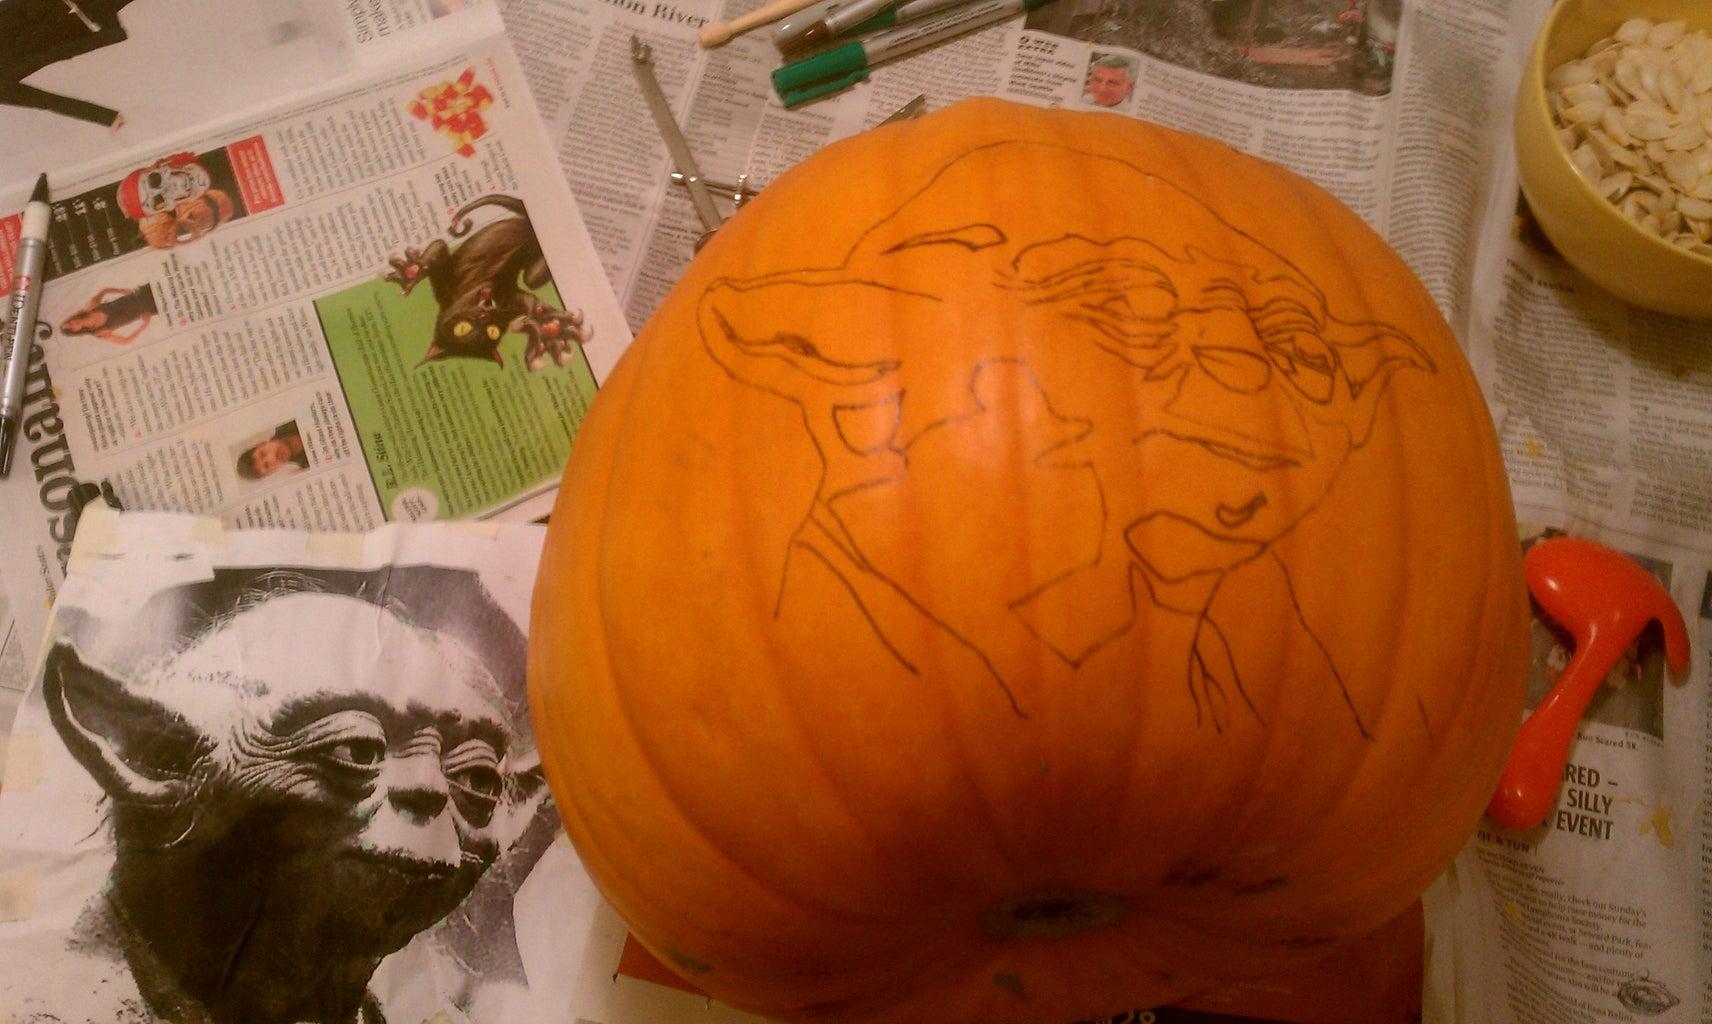 Transpumpfer the Image Onto the Pumpkin